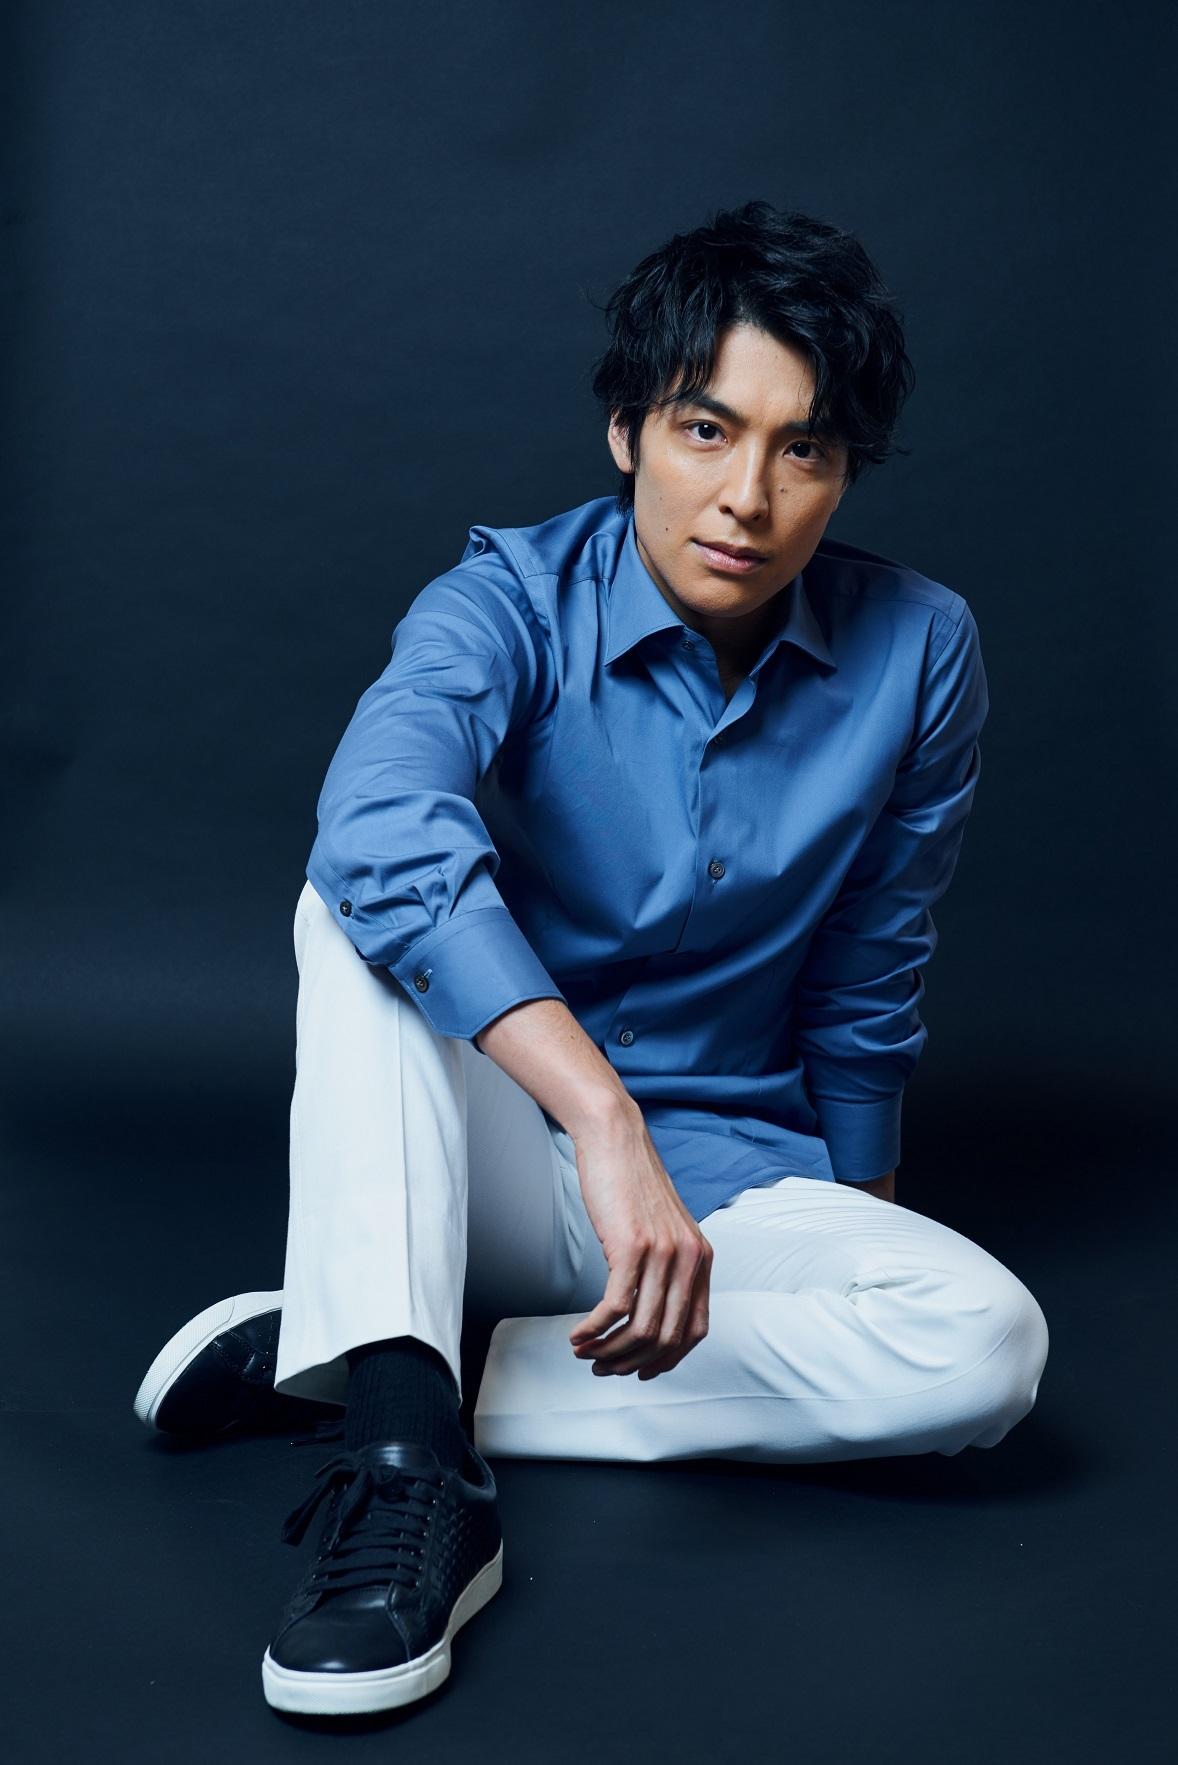 photo by Yusei Fukuyama